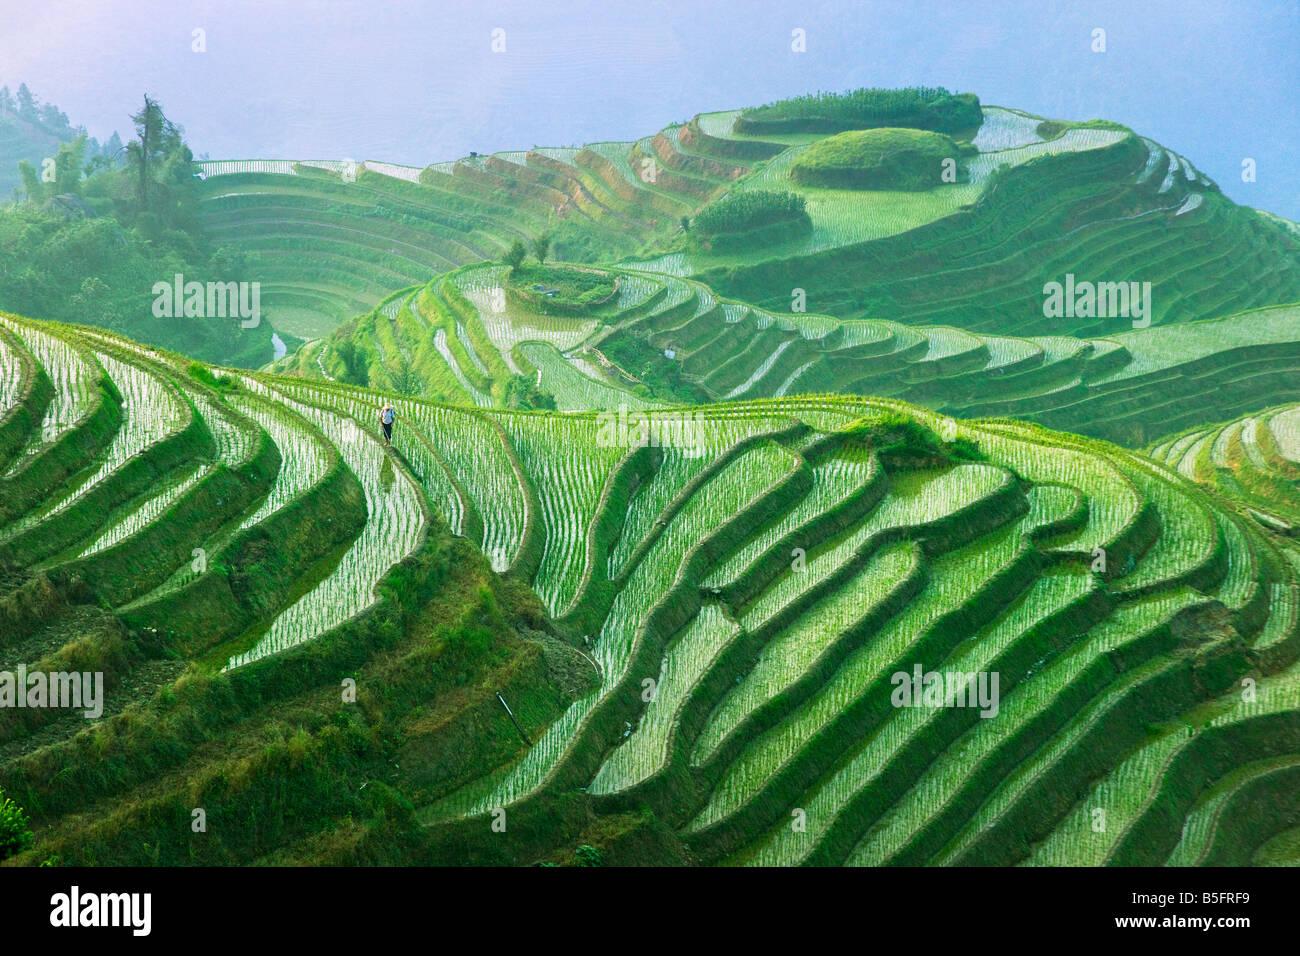 Paysage de rizières en terrasses de Chine Guangxi Longsheng Photo Stock